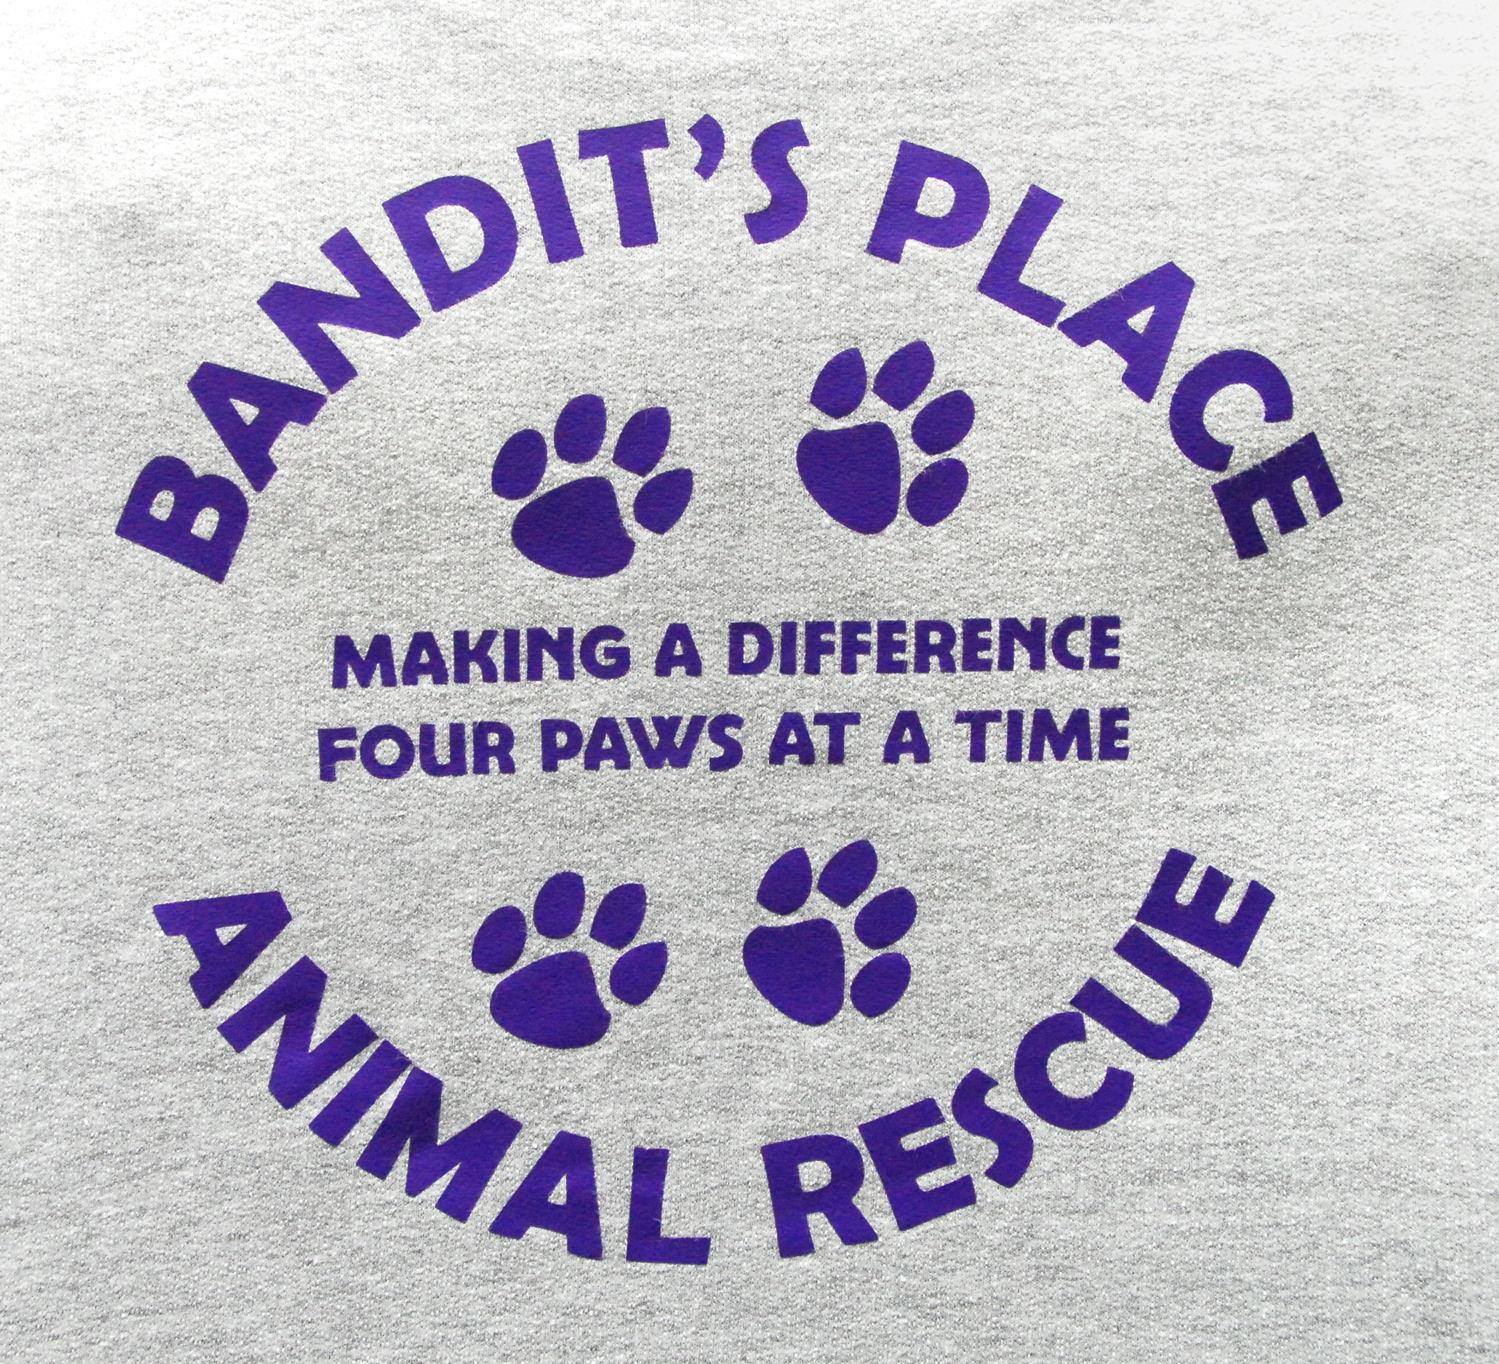 Bandits Place